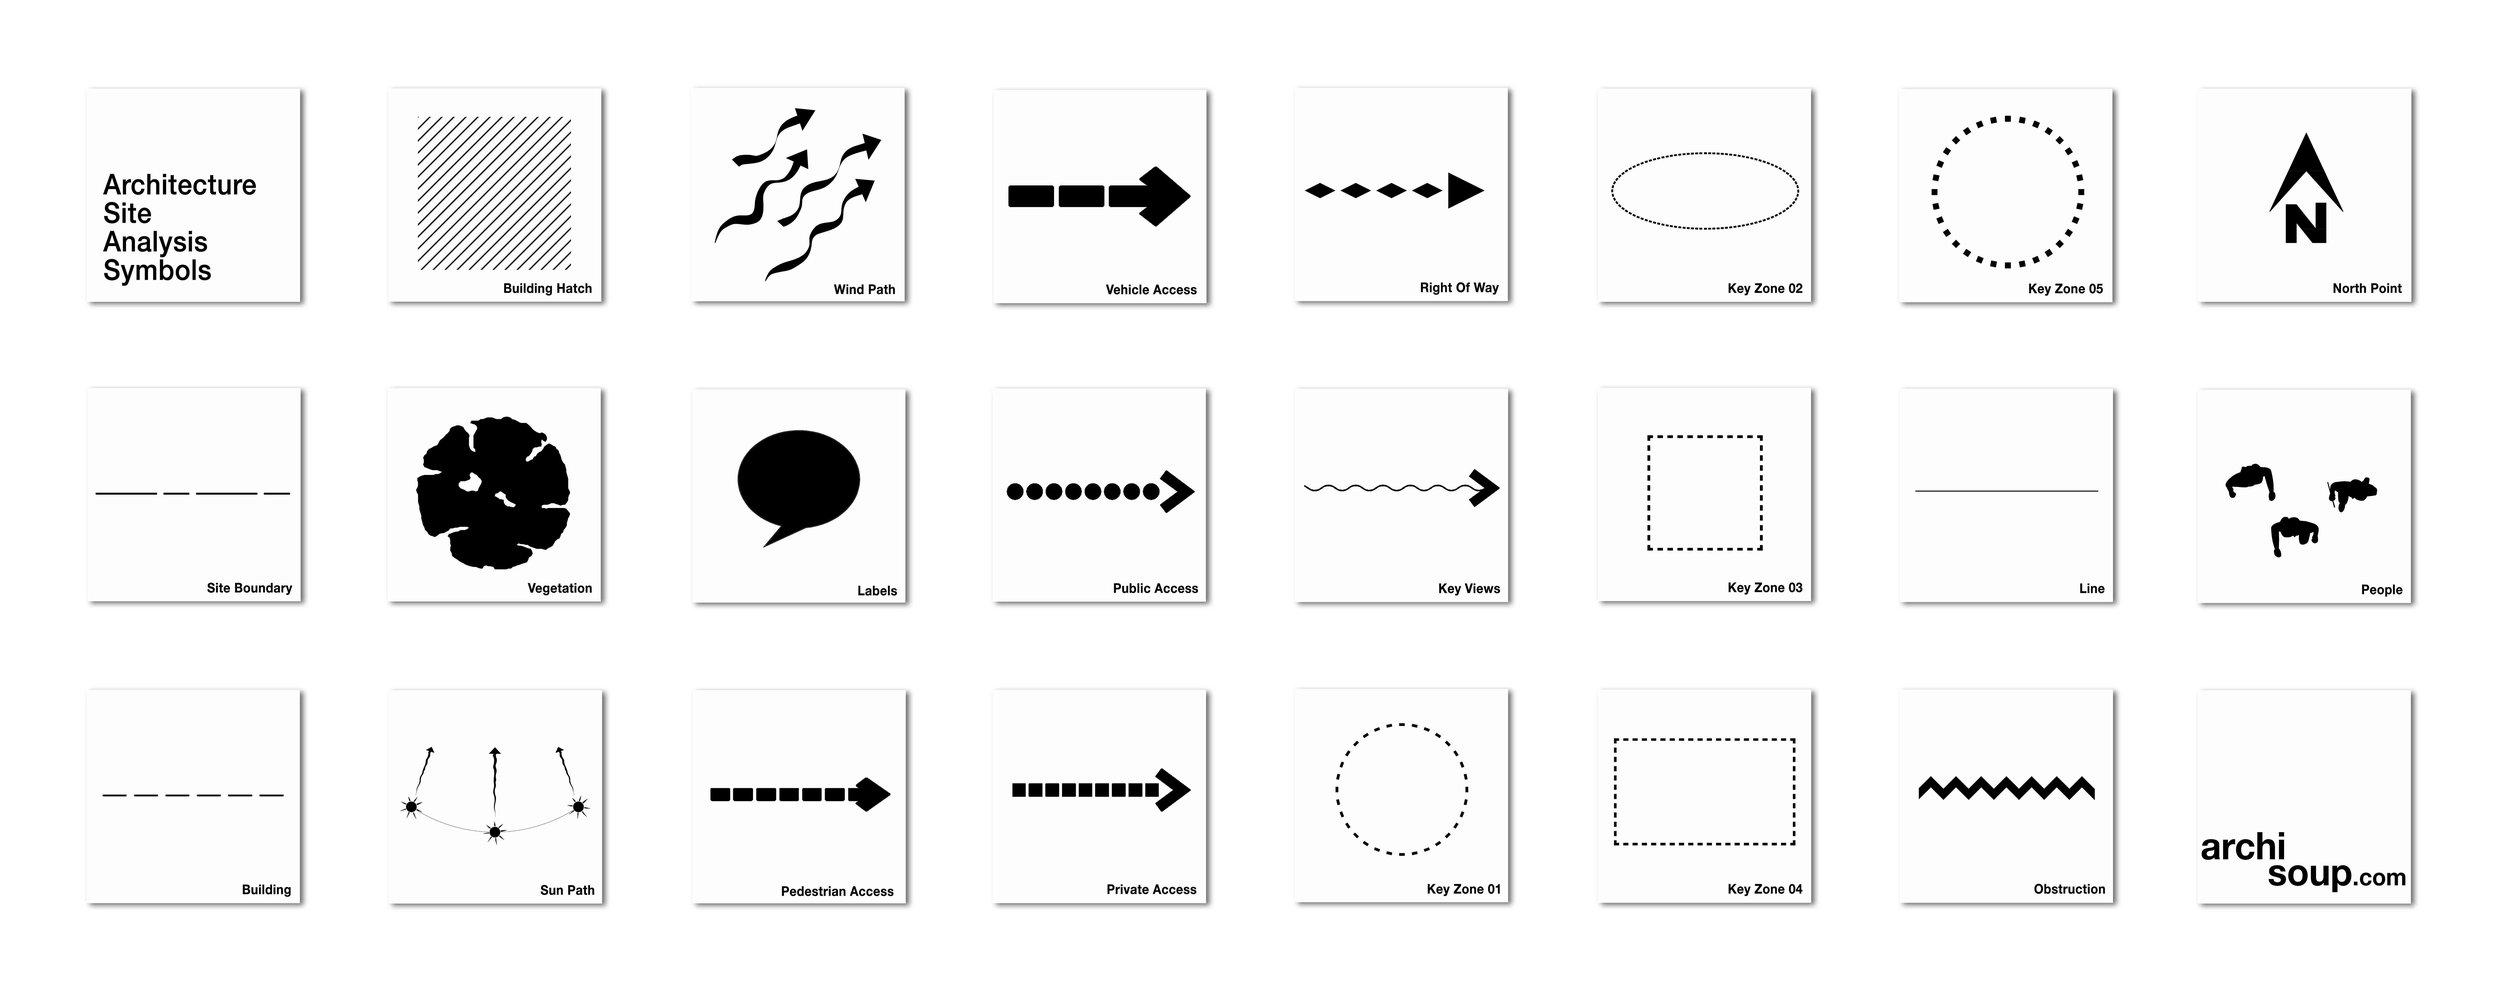 Archisoup-architecture-site-analysis-diagrams-symbols.jpg